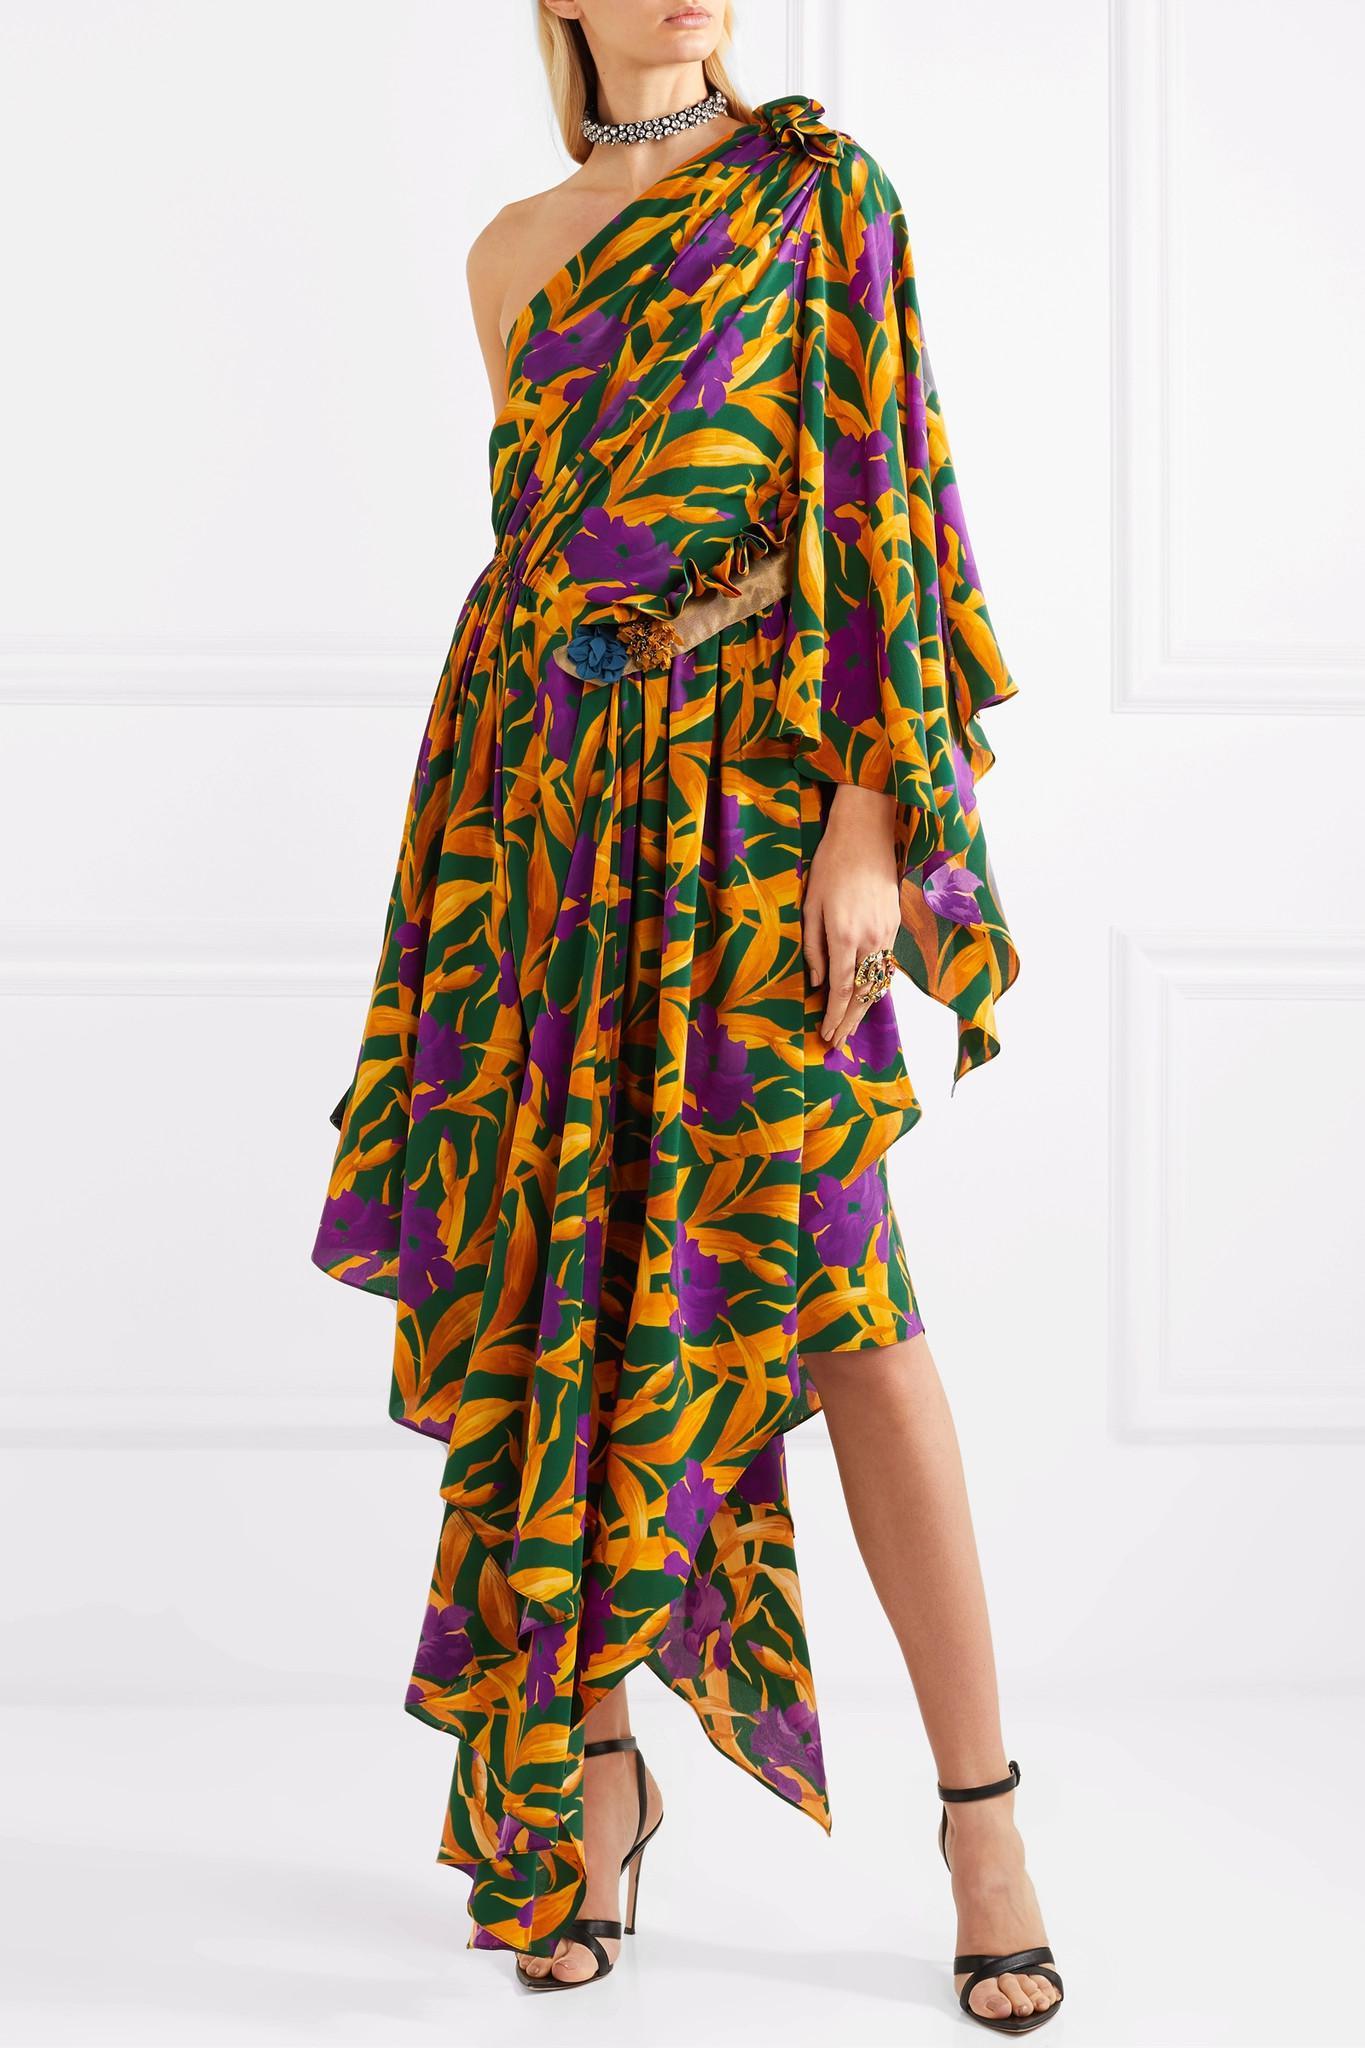 fe07b3cef9be2f Gucci - Yellow One-shoulder Appliquéd Printed Silk Crepe De Chine Dress -  Lyst. View fullscreen